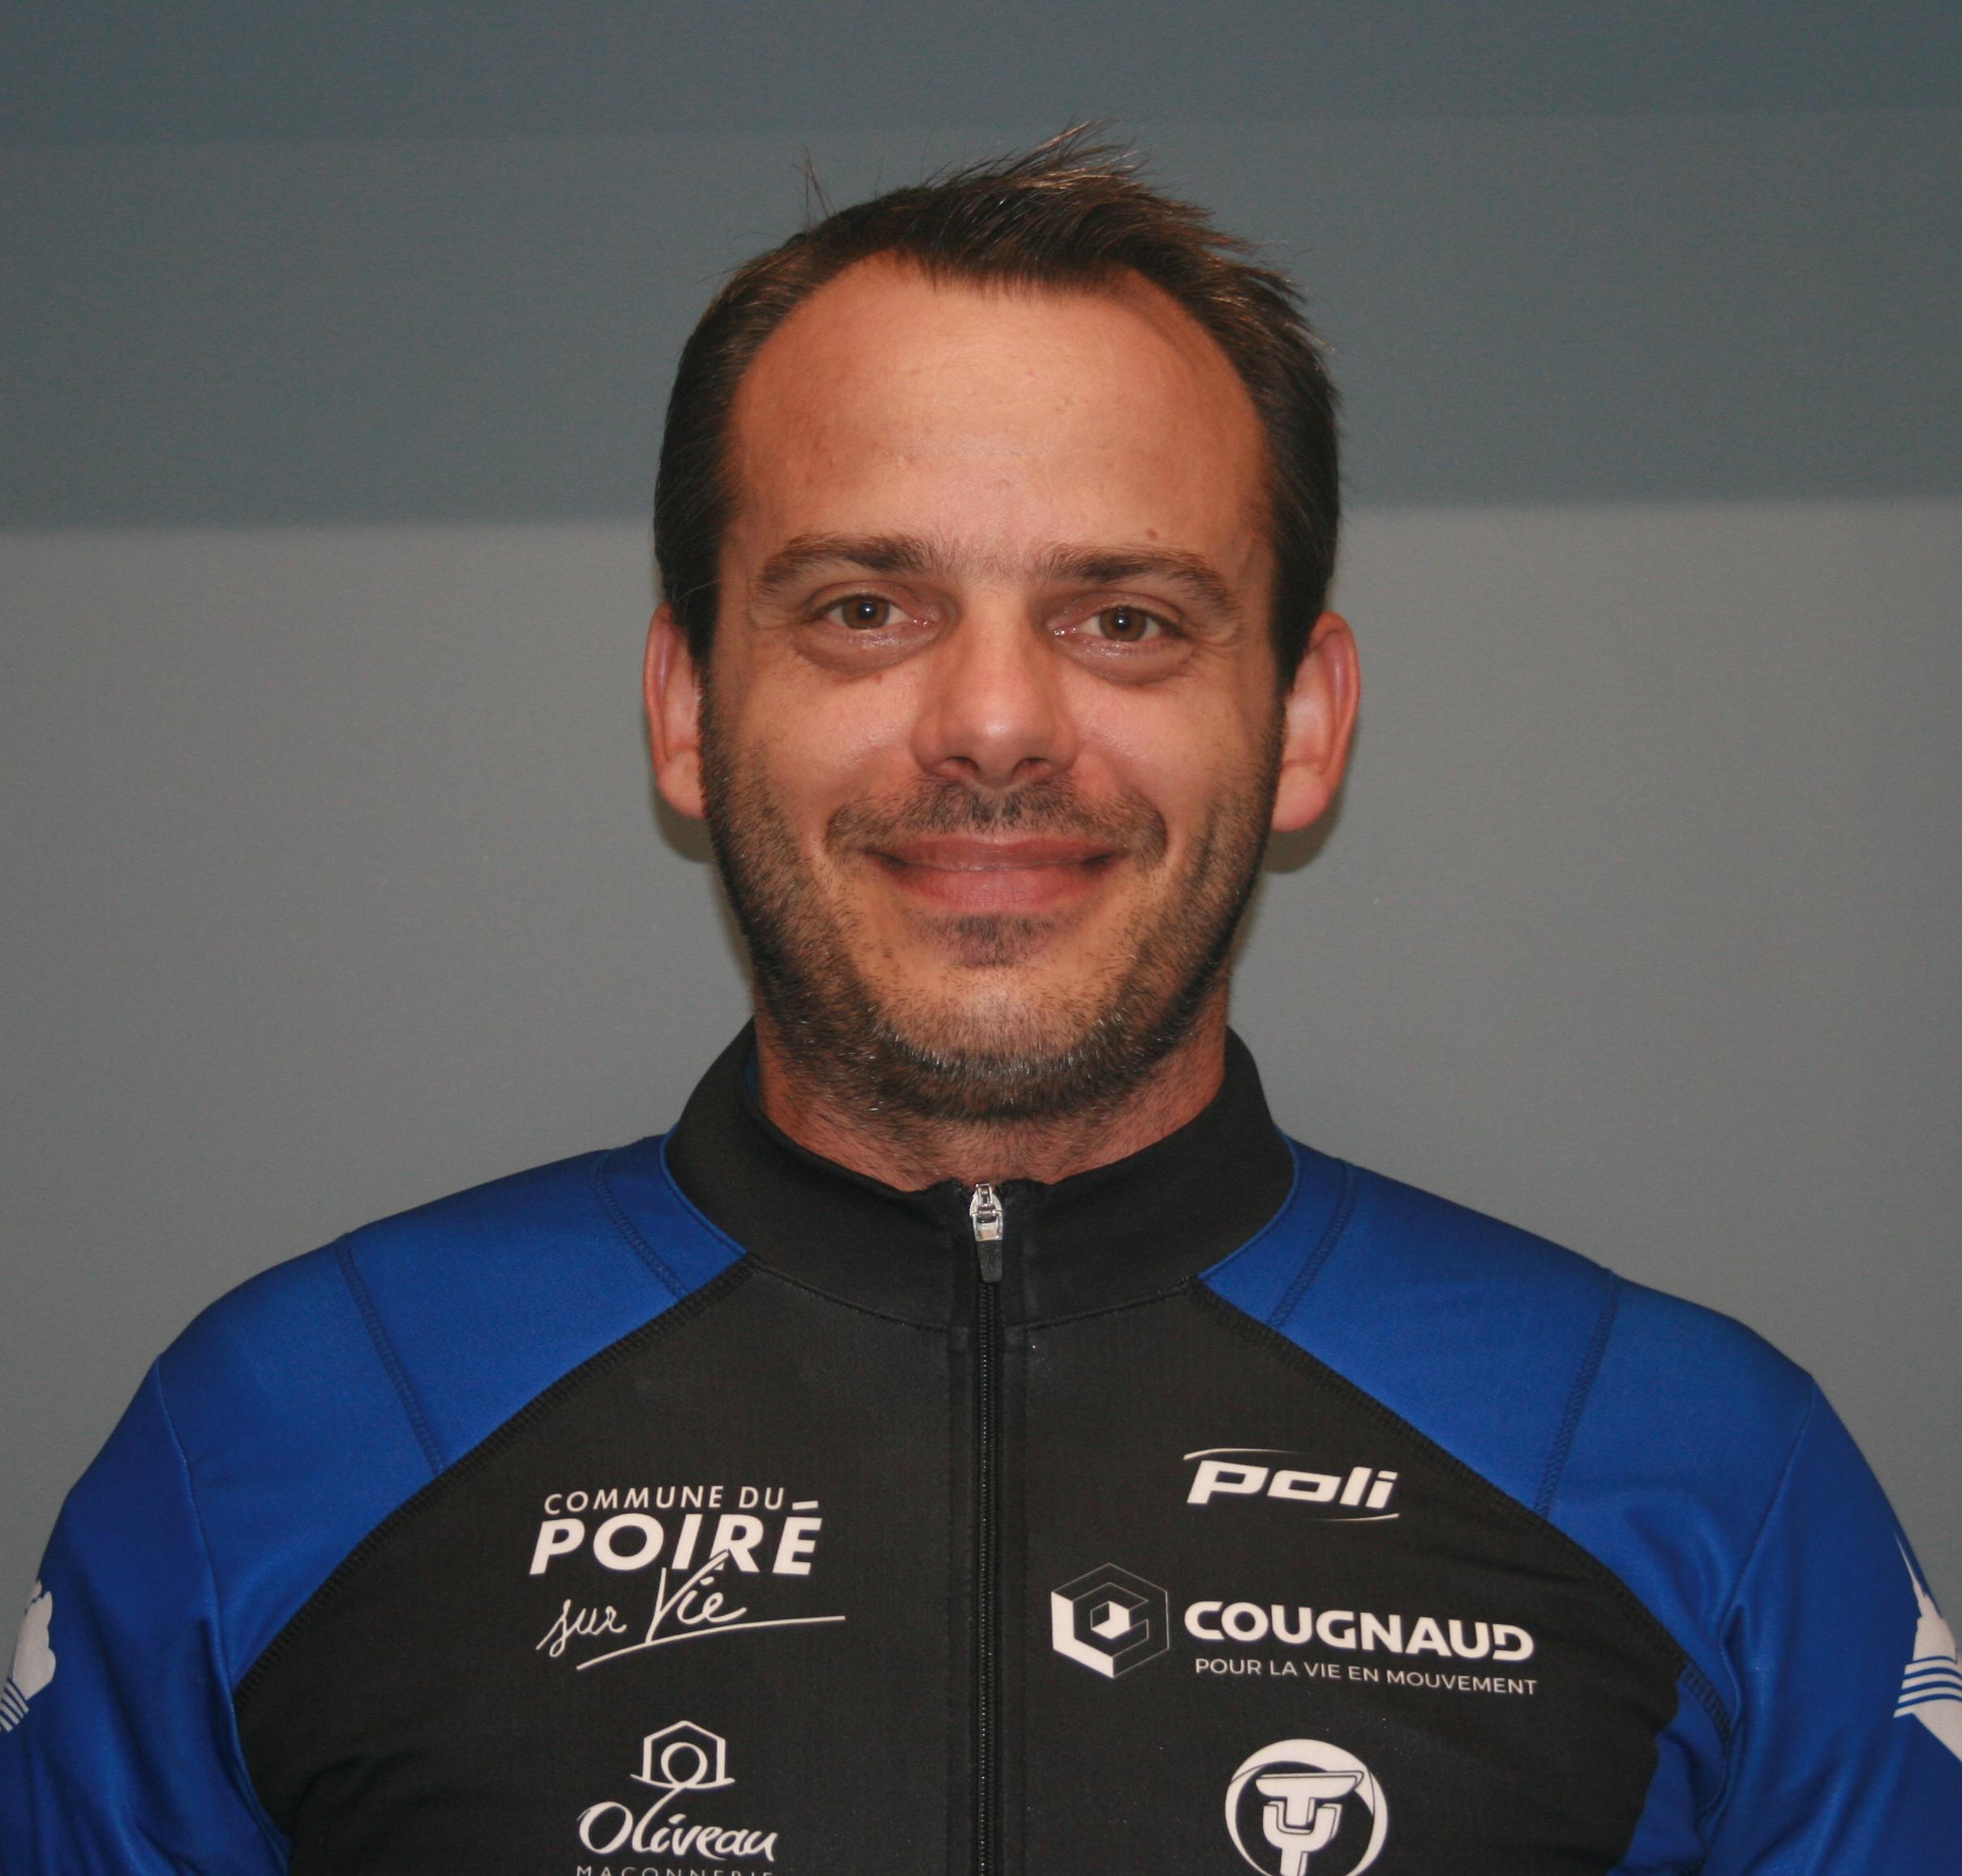 Sébastien Rocheteau